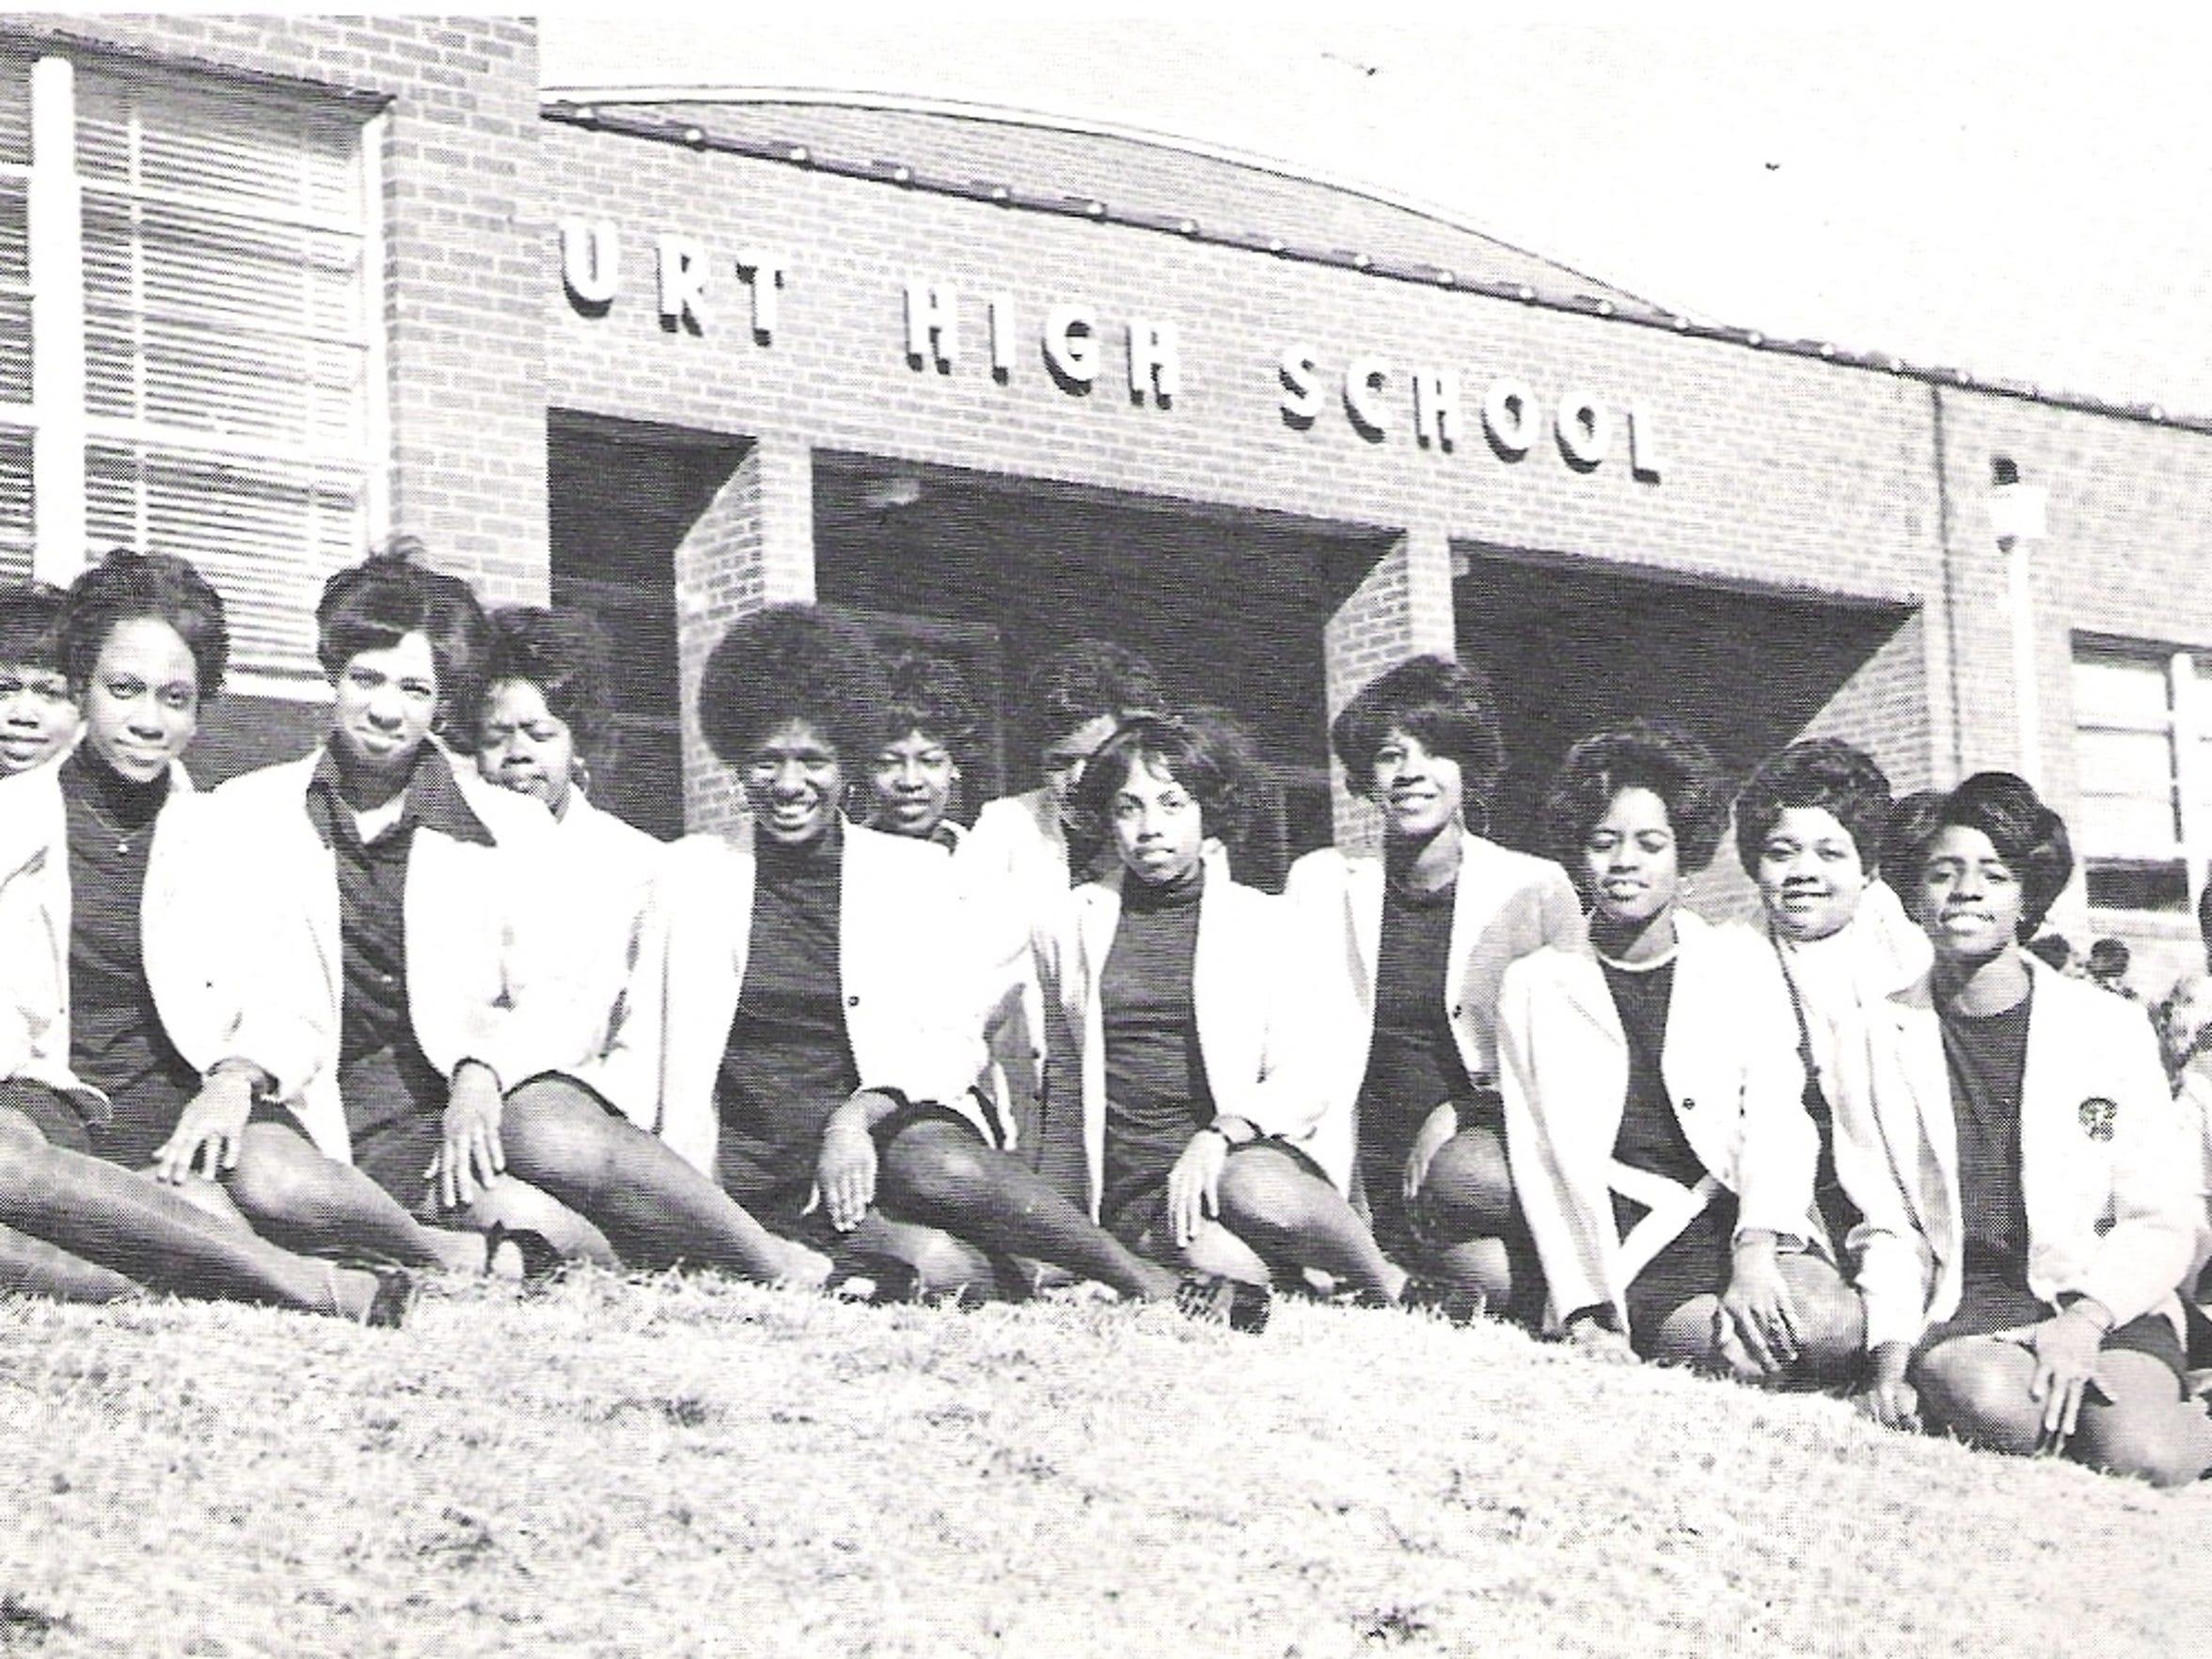 Burt High School.